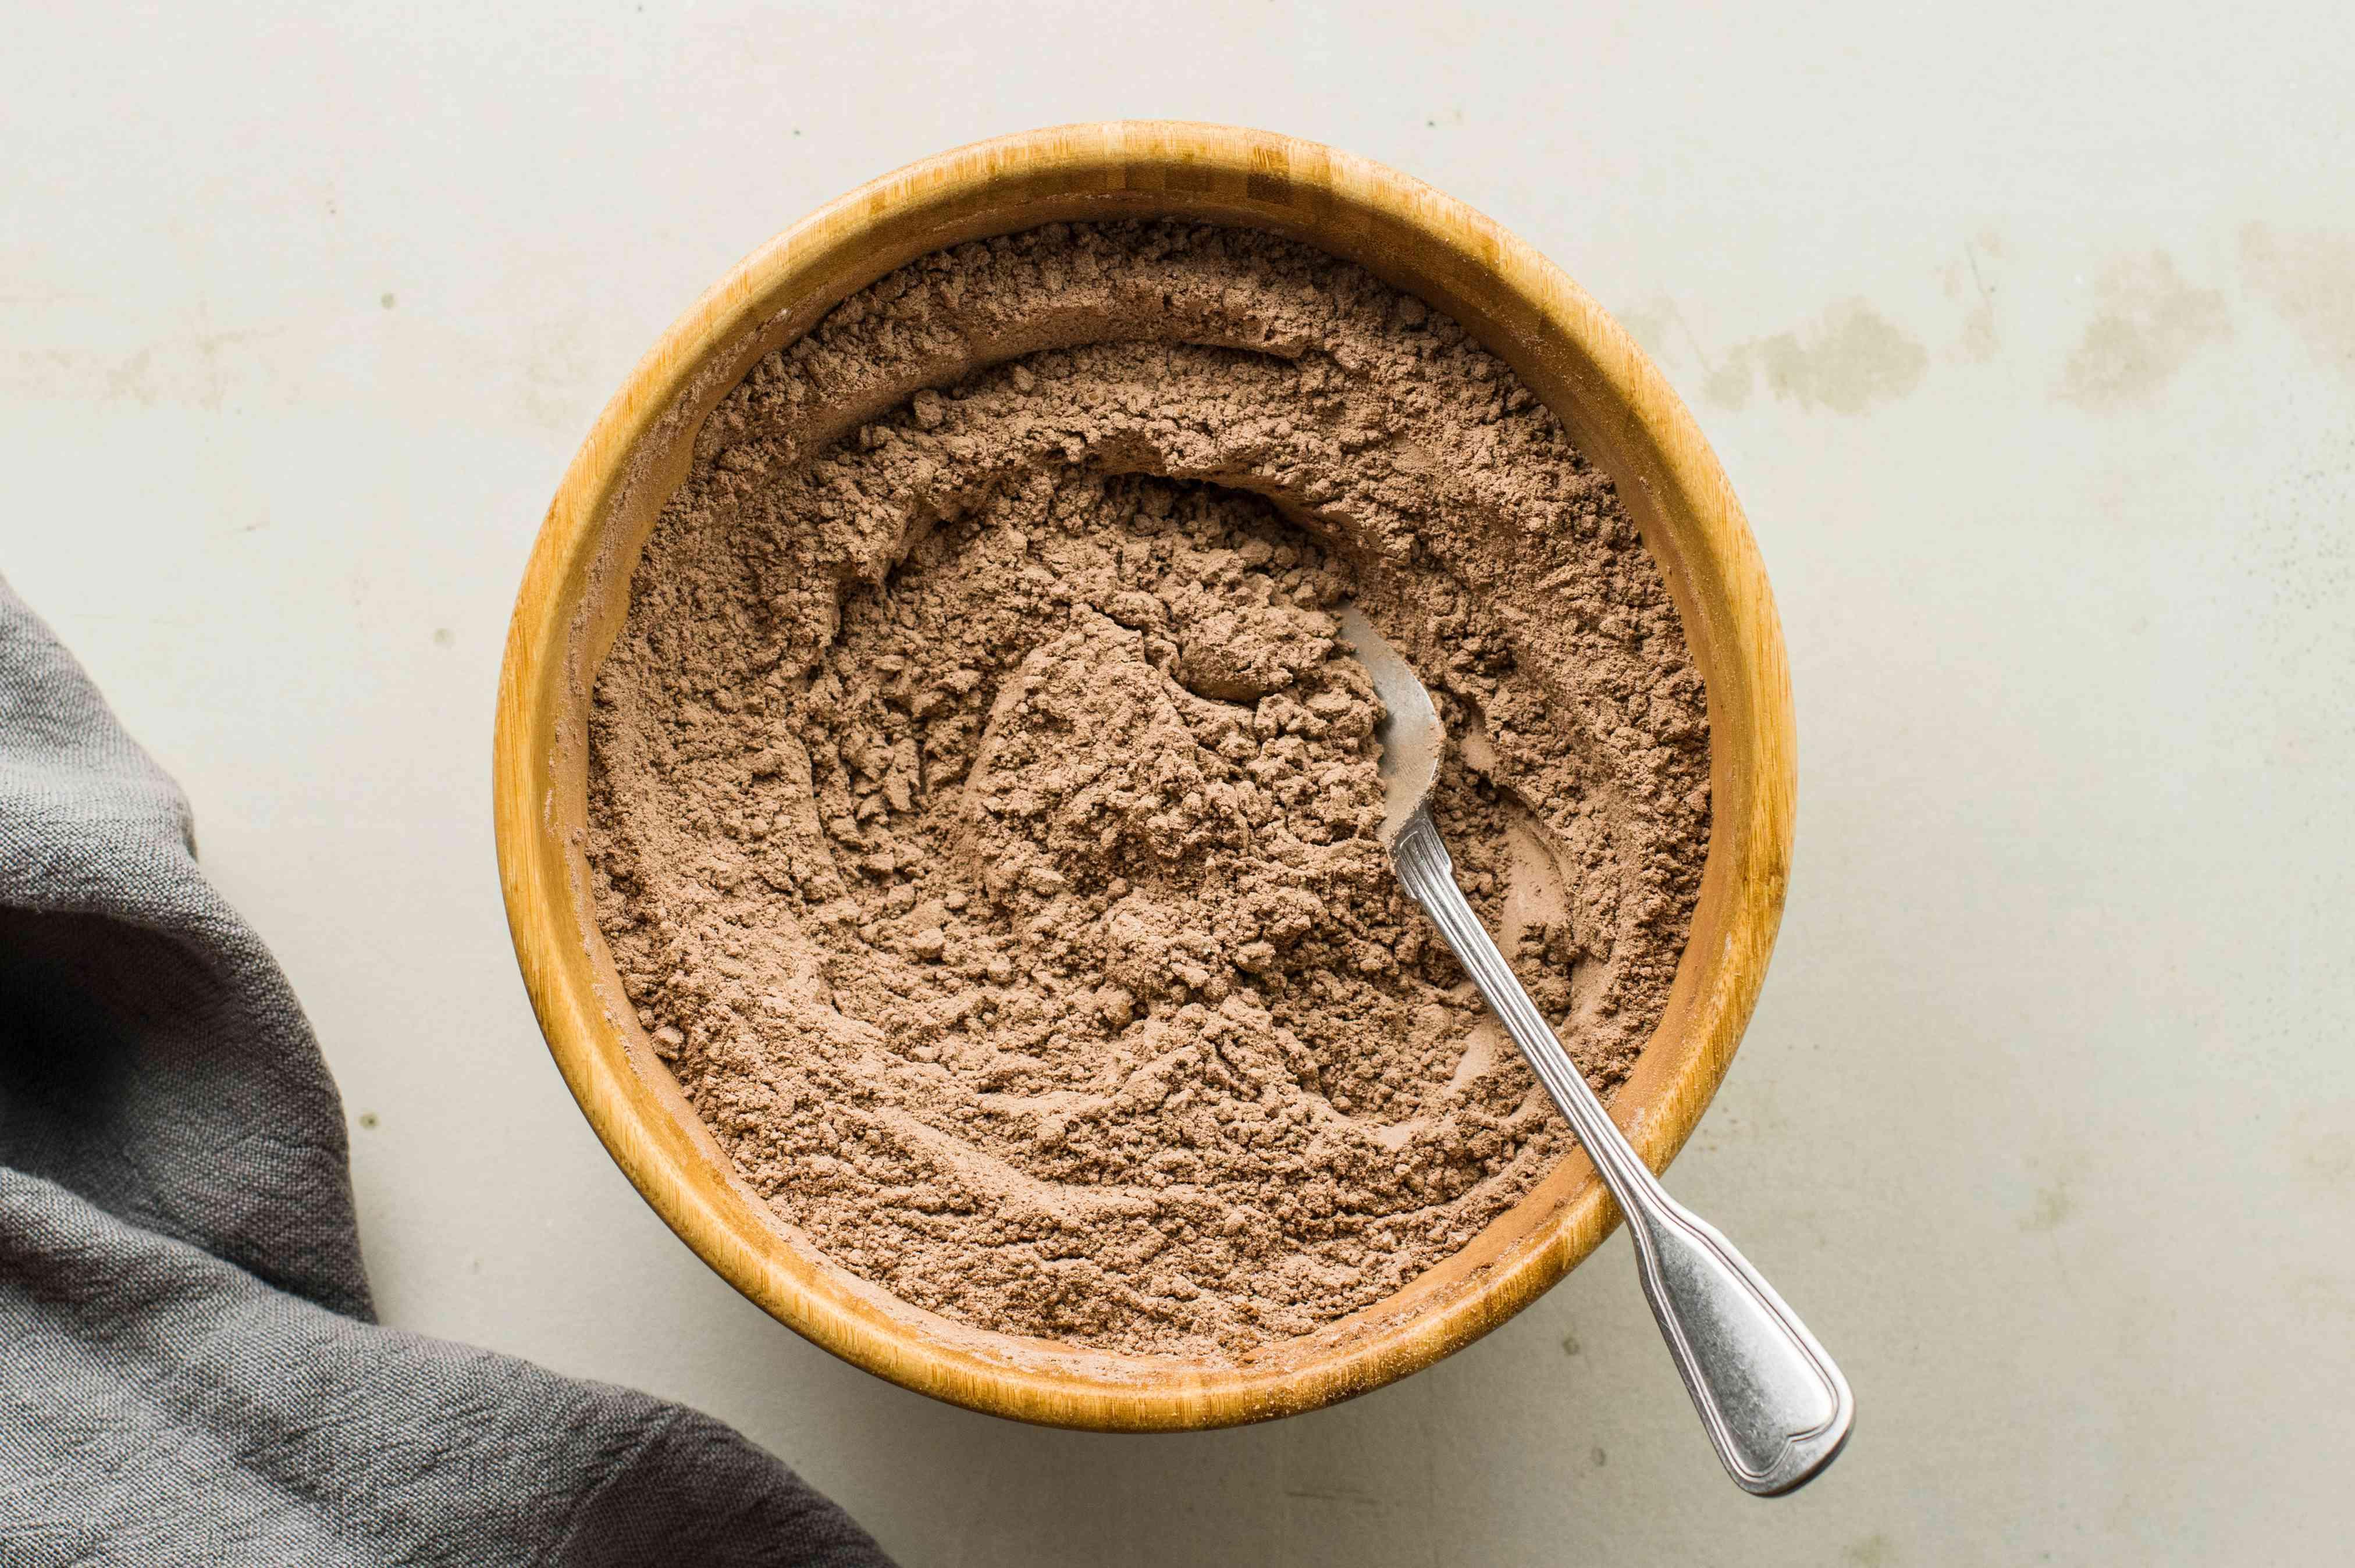 Combine flour and cocoa powder